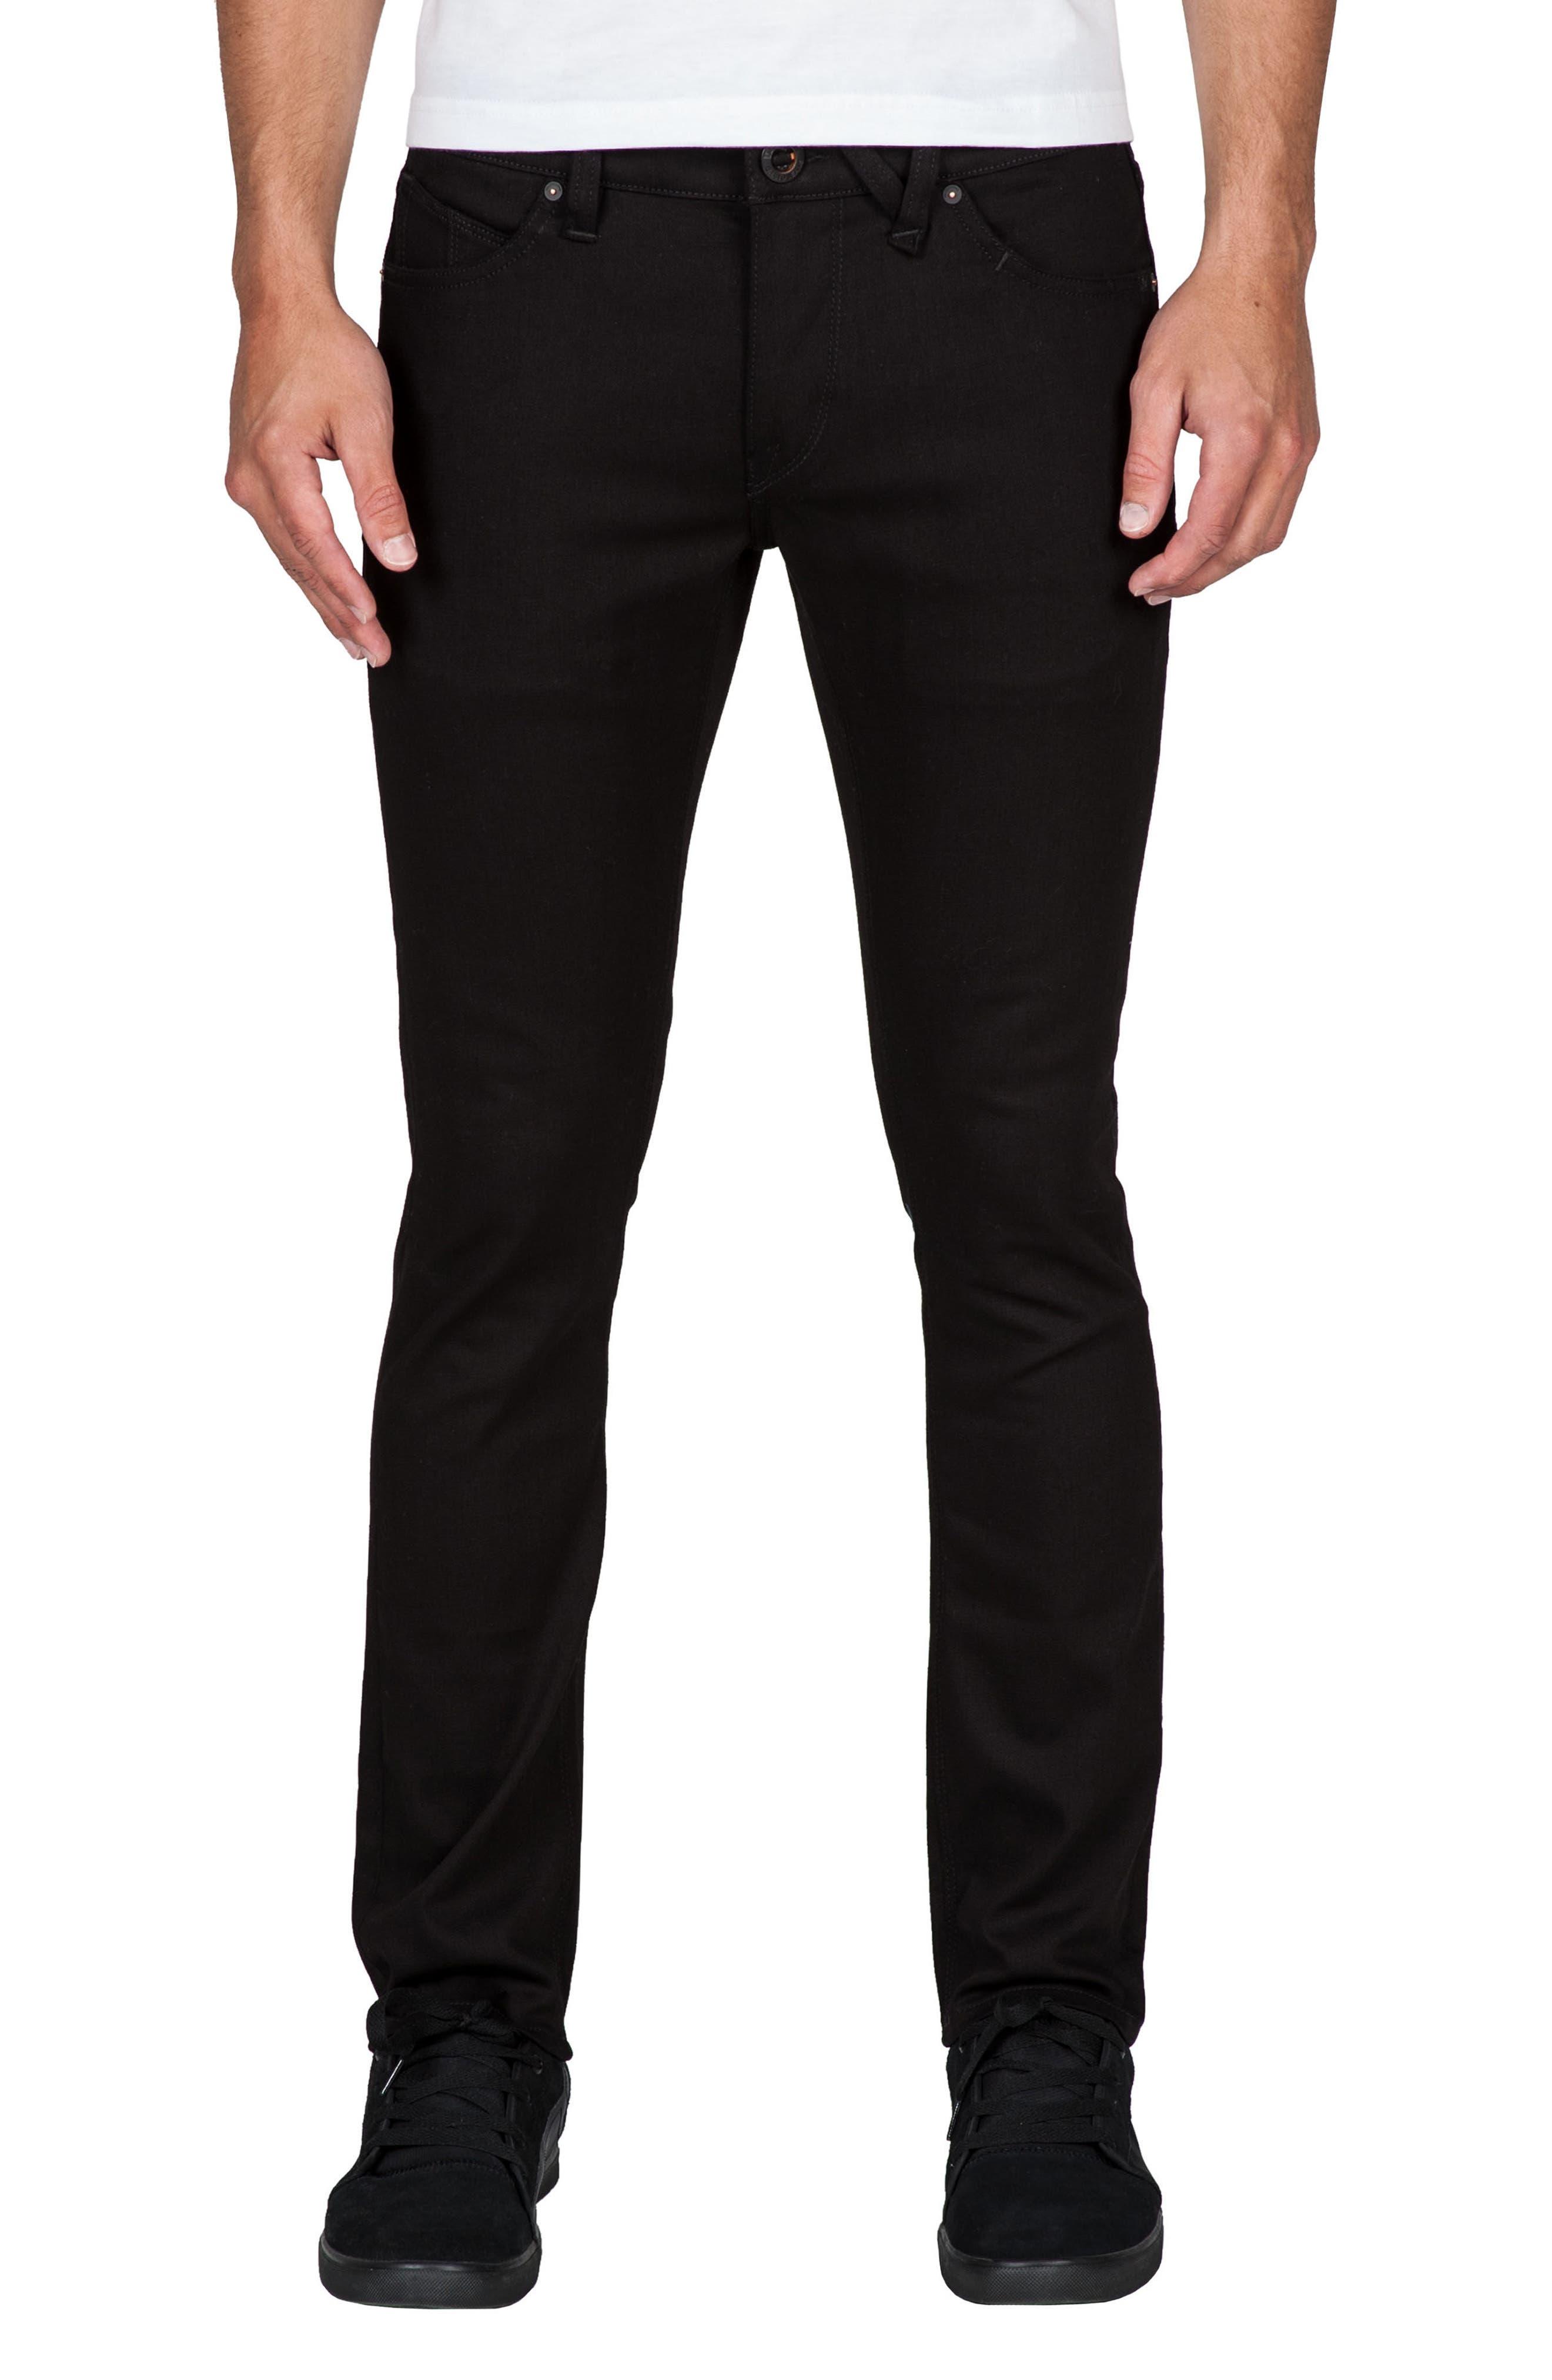 2x4 Slim Straight Leg Jeans,                         Main,                         color, BLACK BLACK